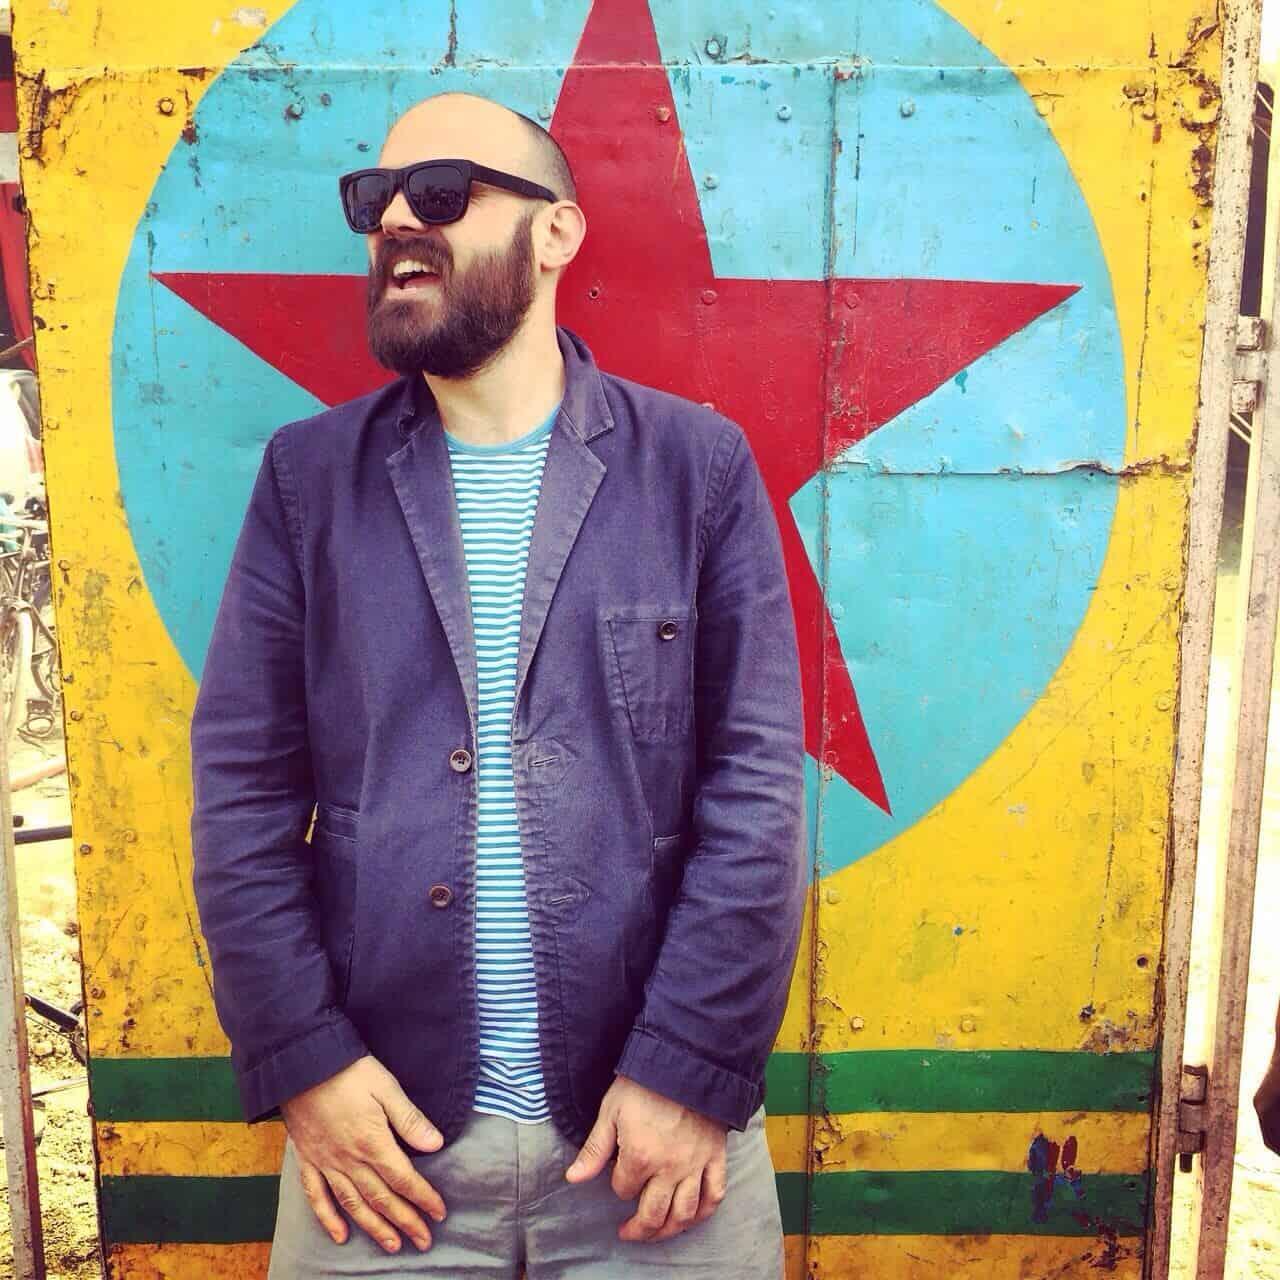 Simon Goff, founder of designer rugs company Floor_Story